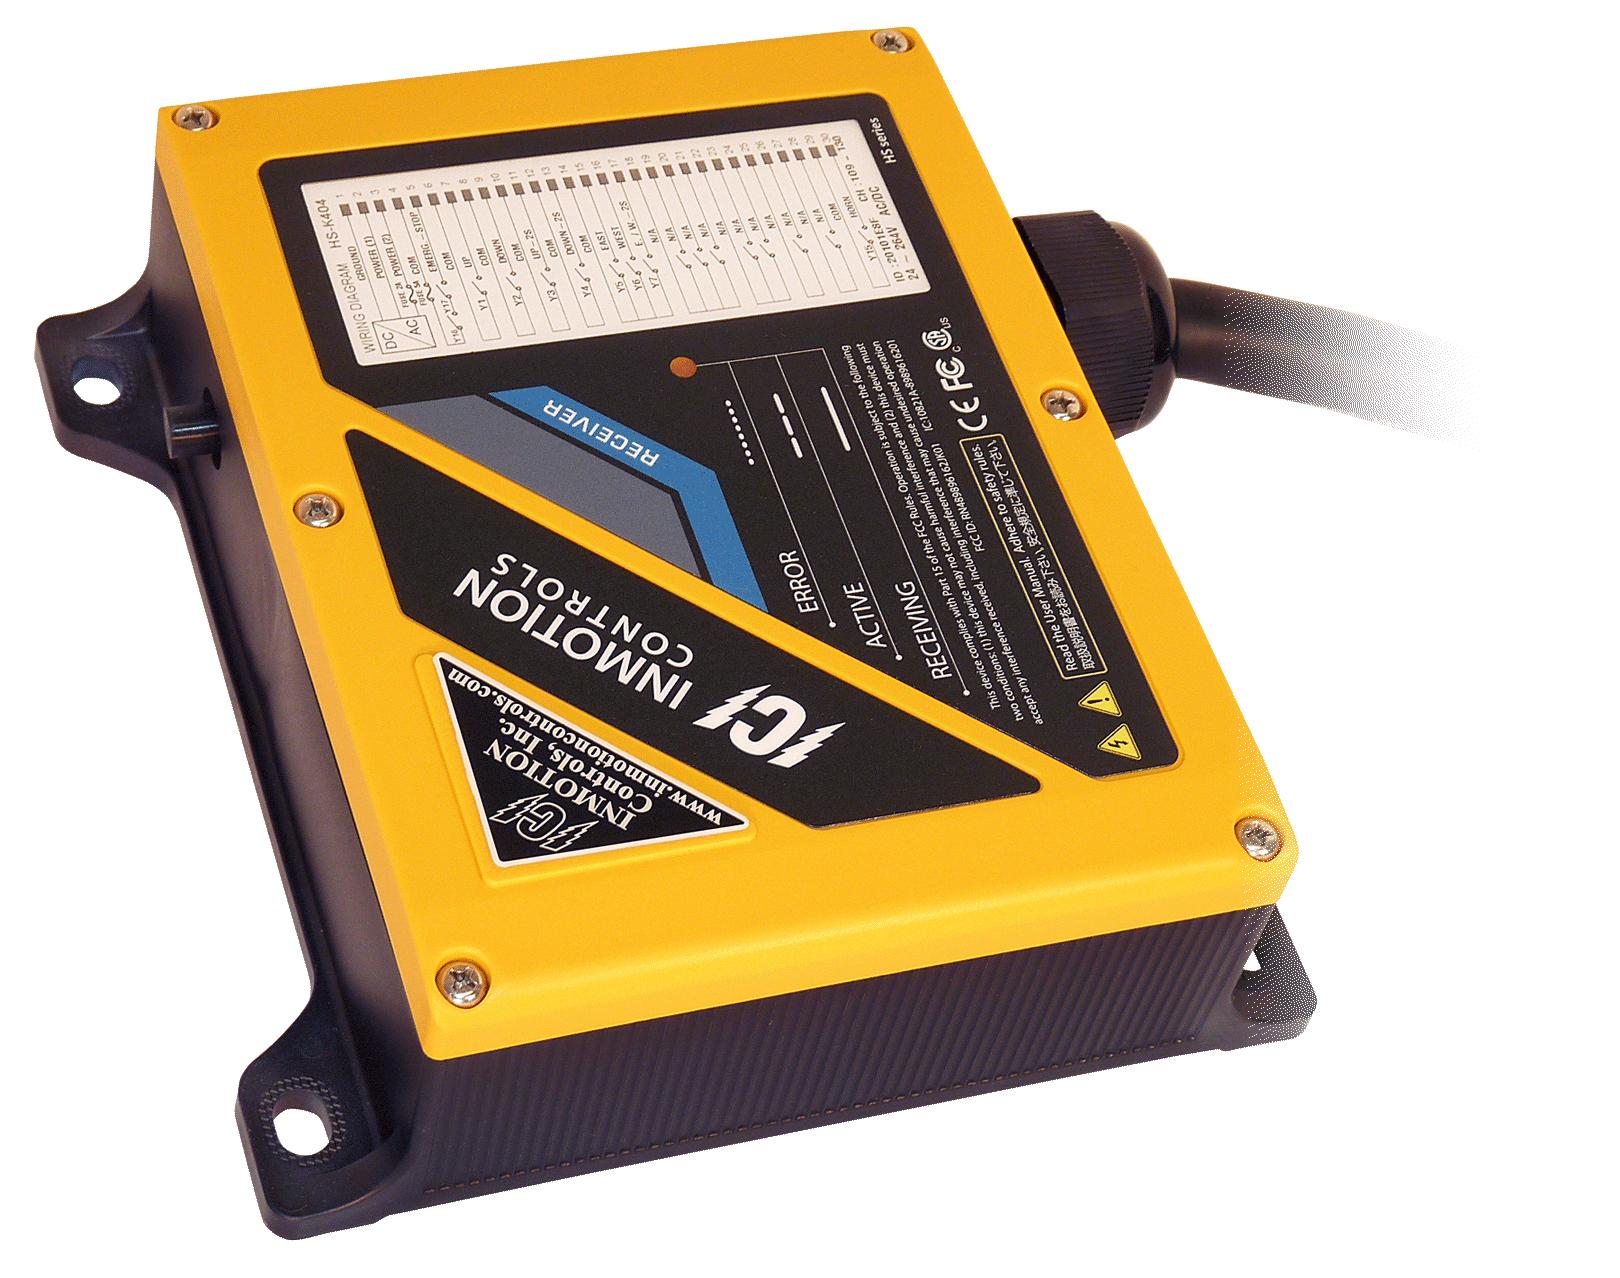 K400-SYSTEM-28